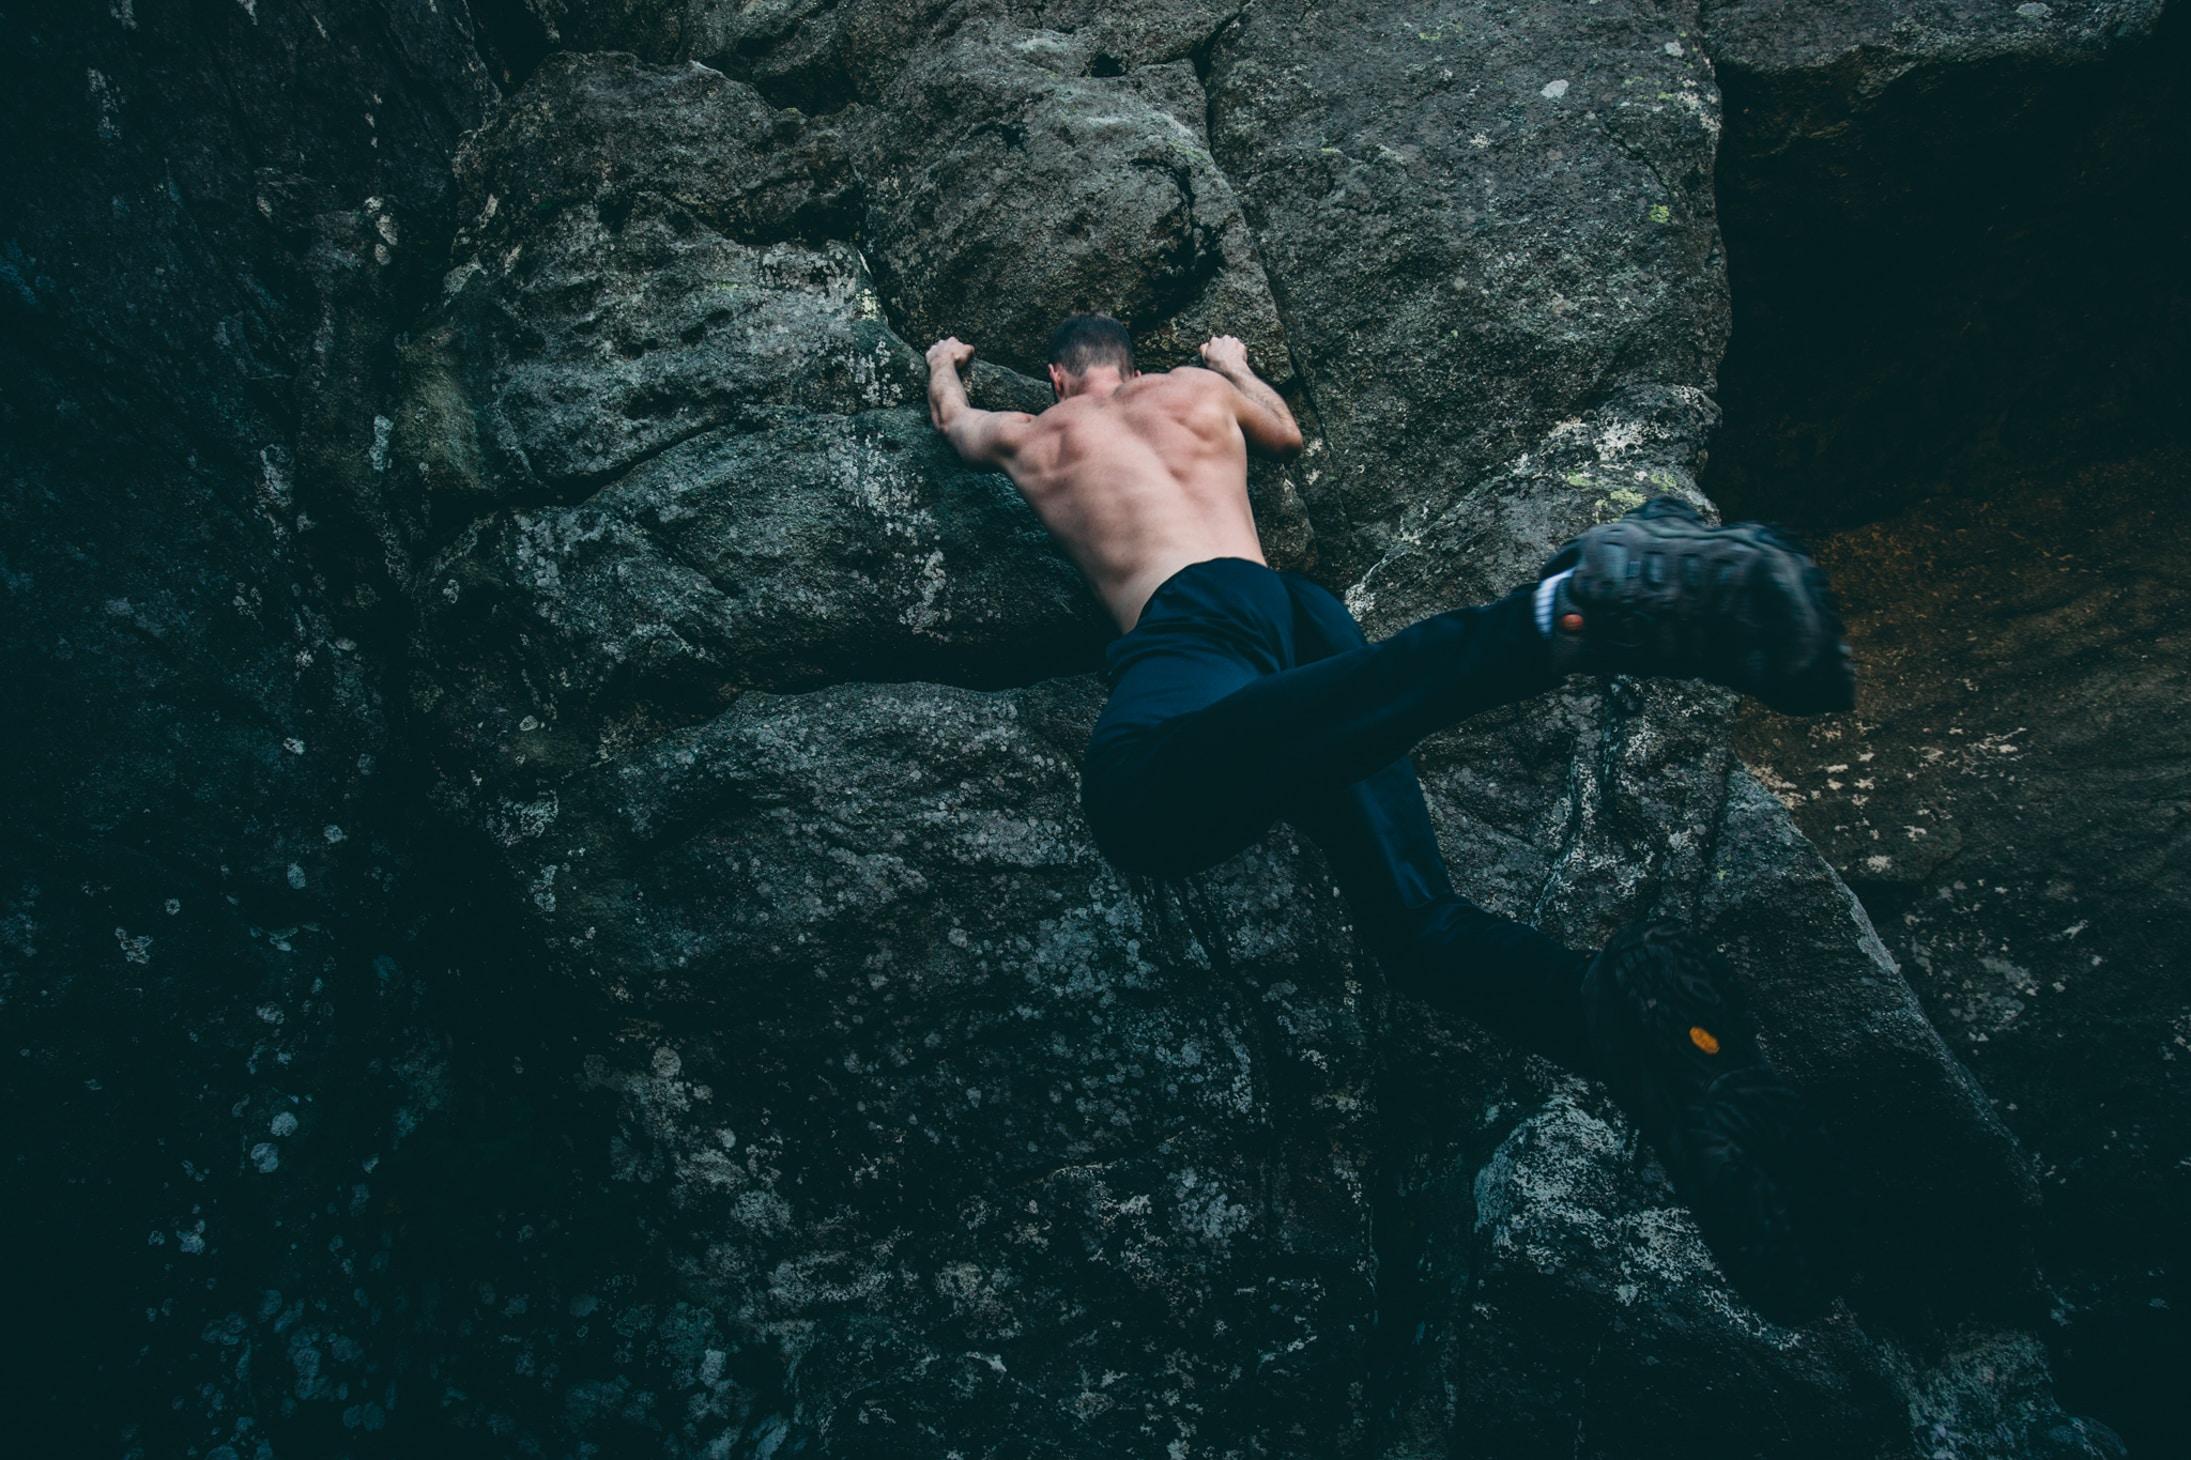 man rock climbing on gray rock